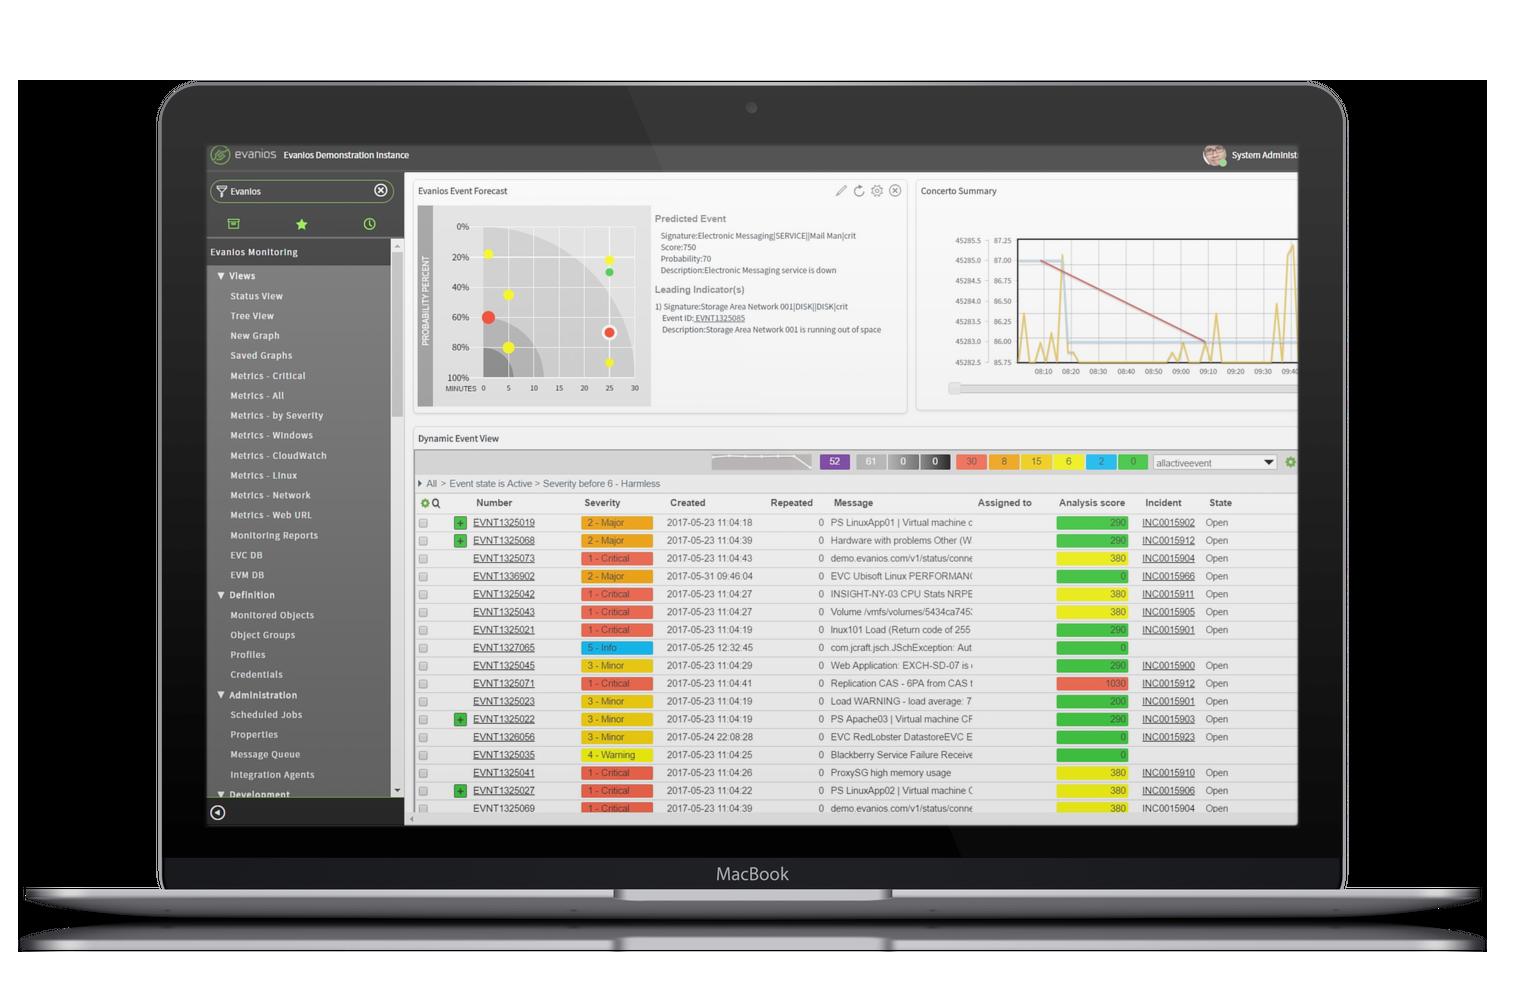 Unified platform macbook air transparent (1).png